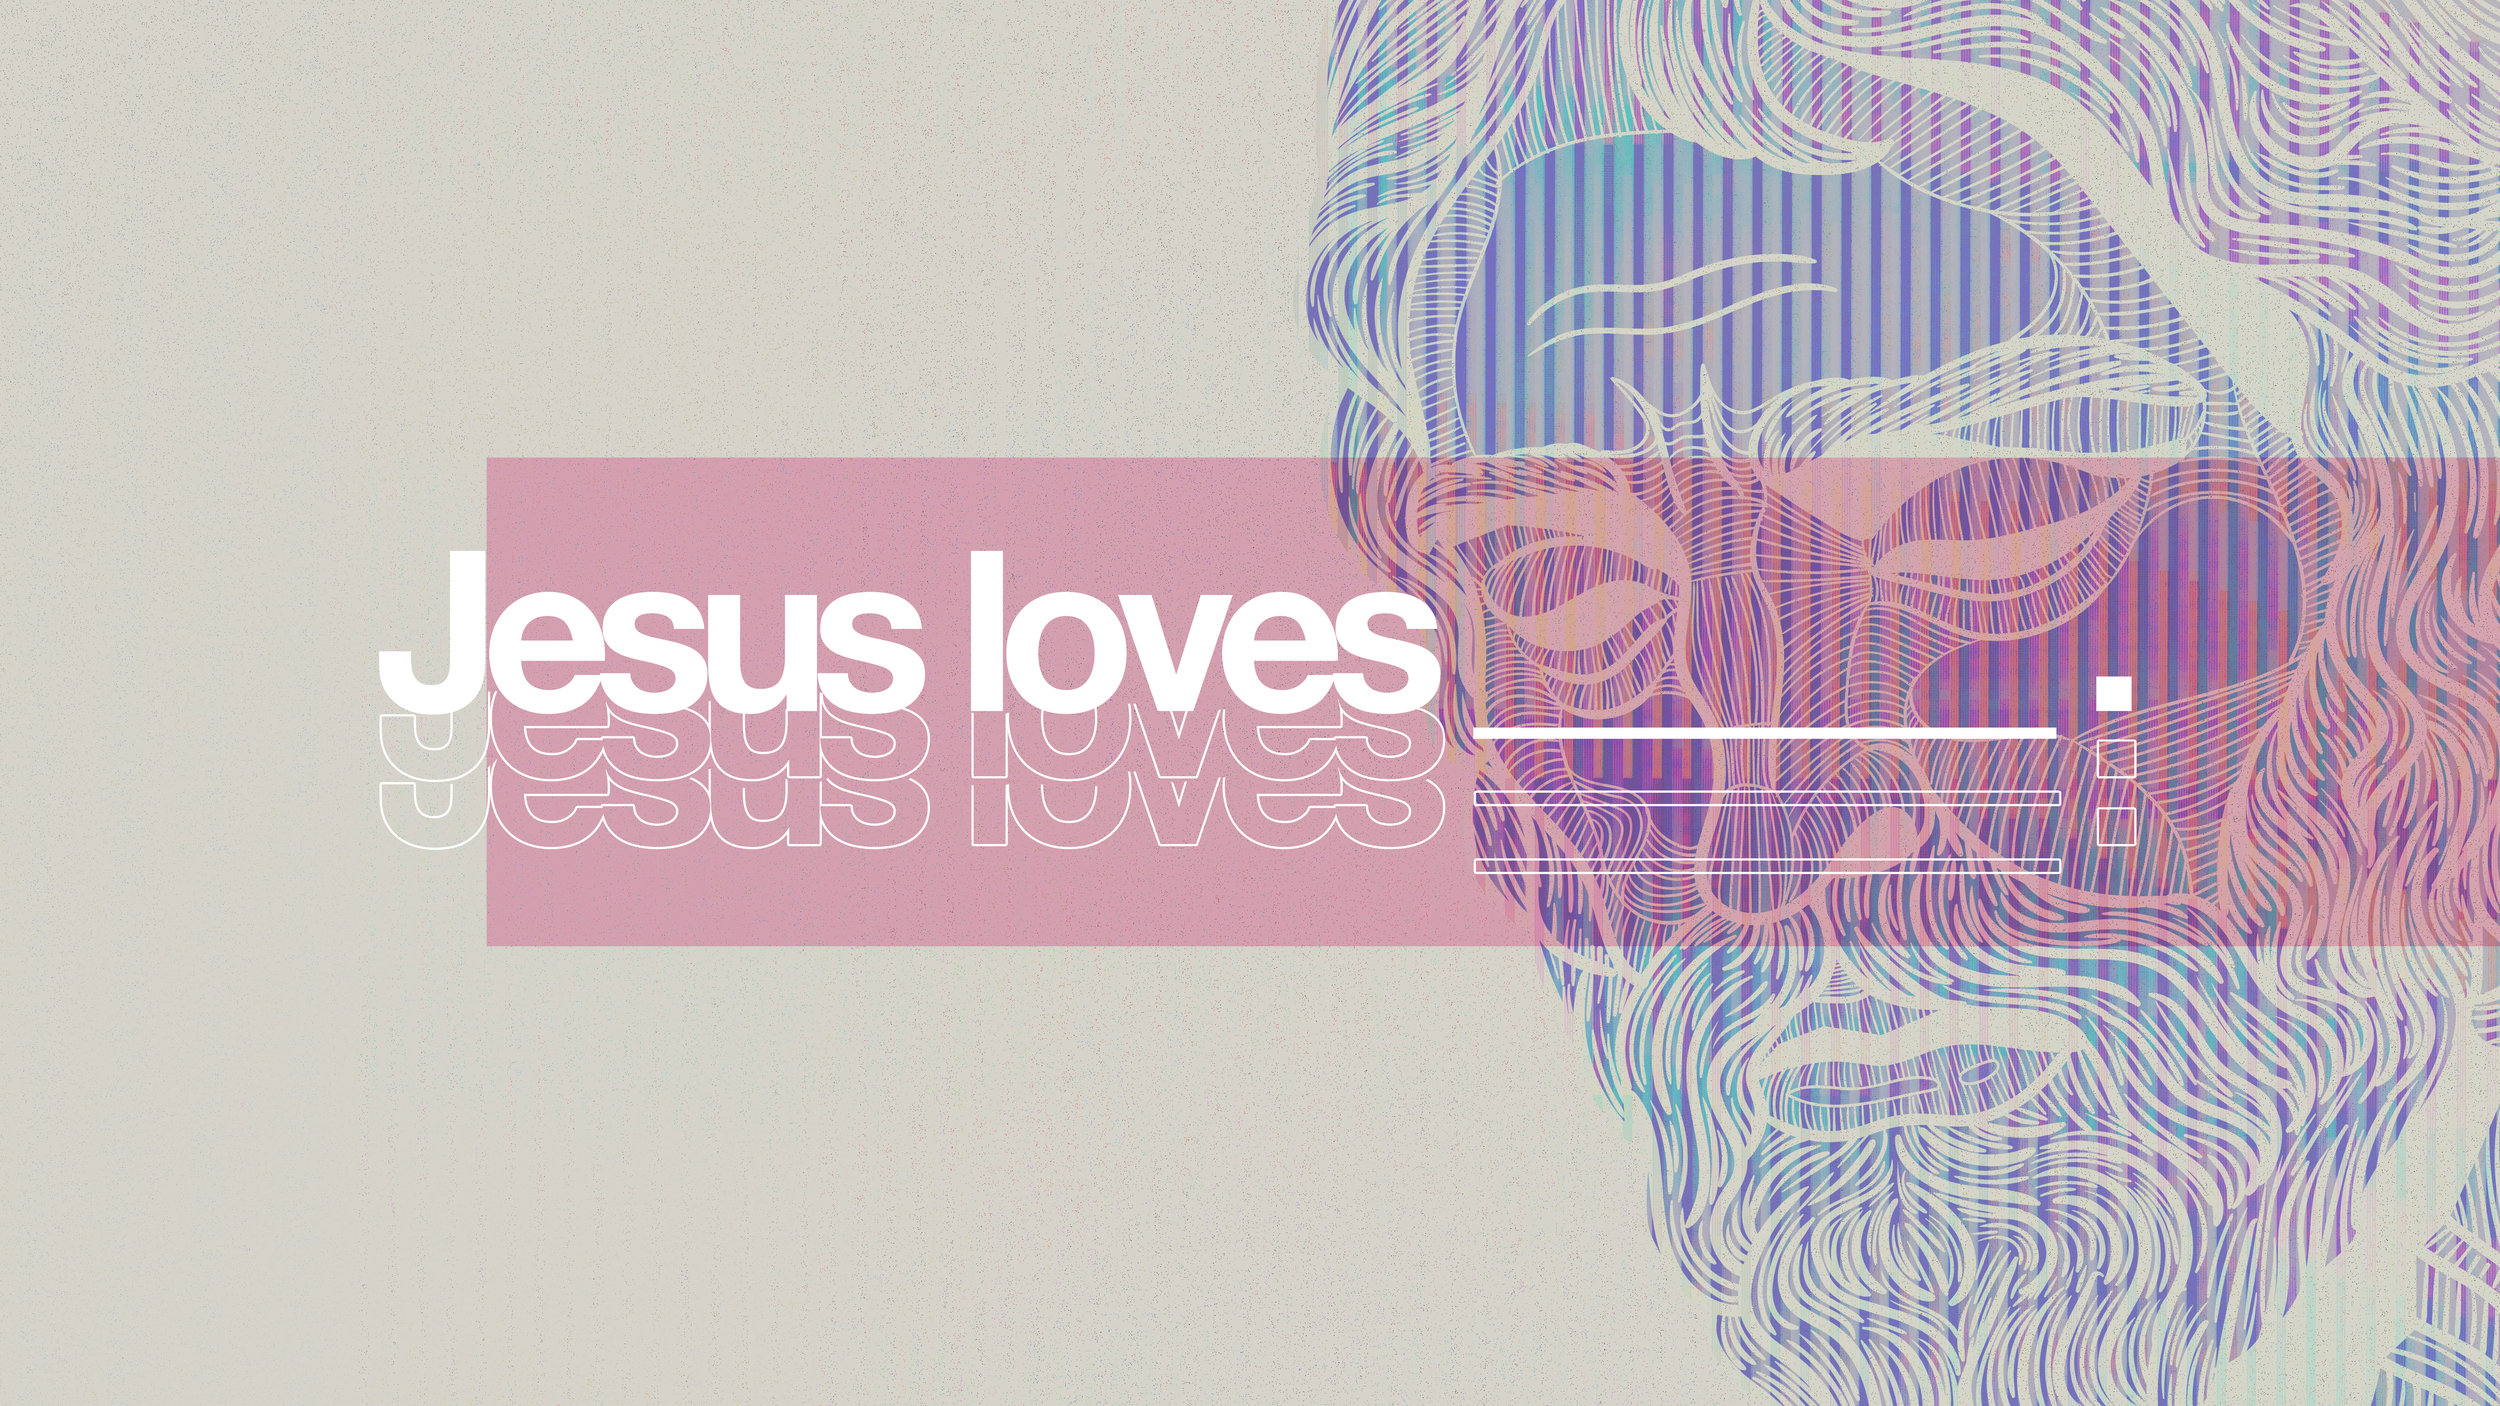 JesusLoves_Title_Grow.jpg